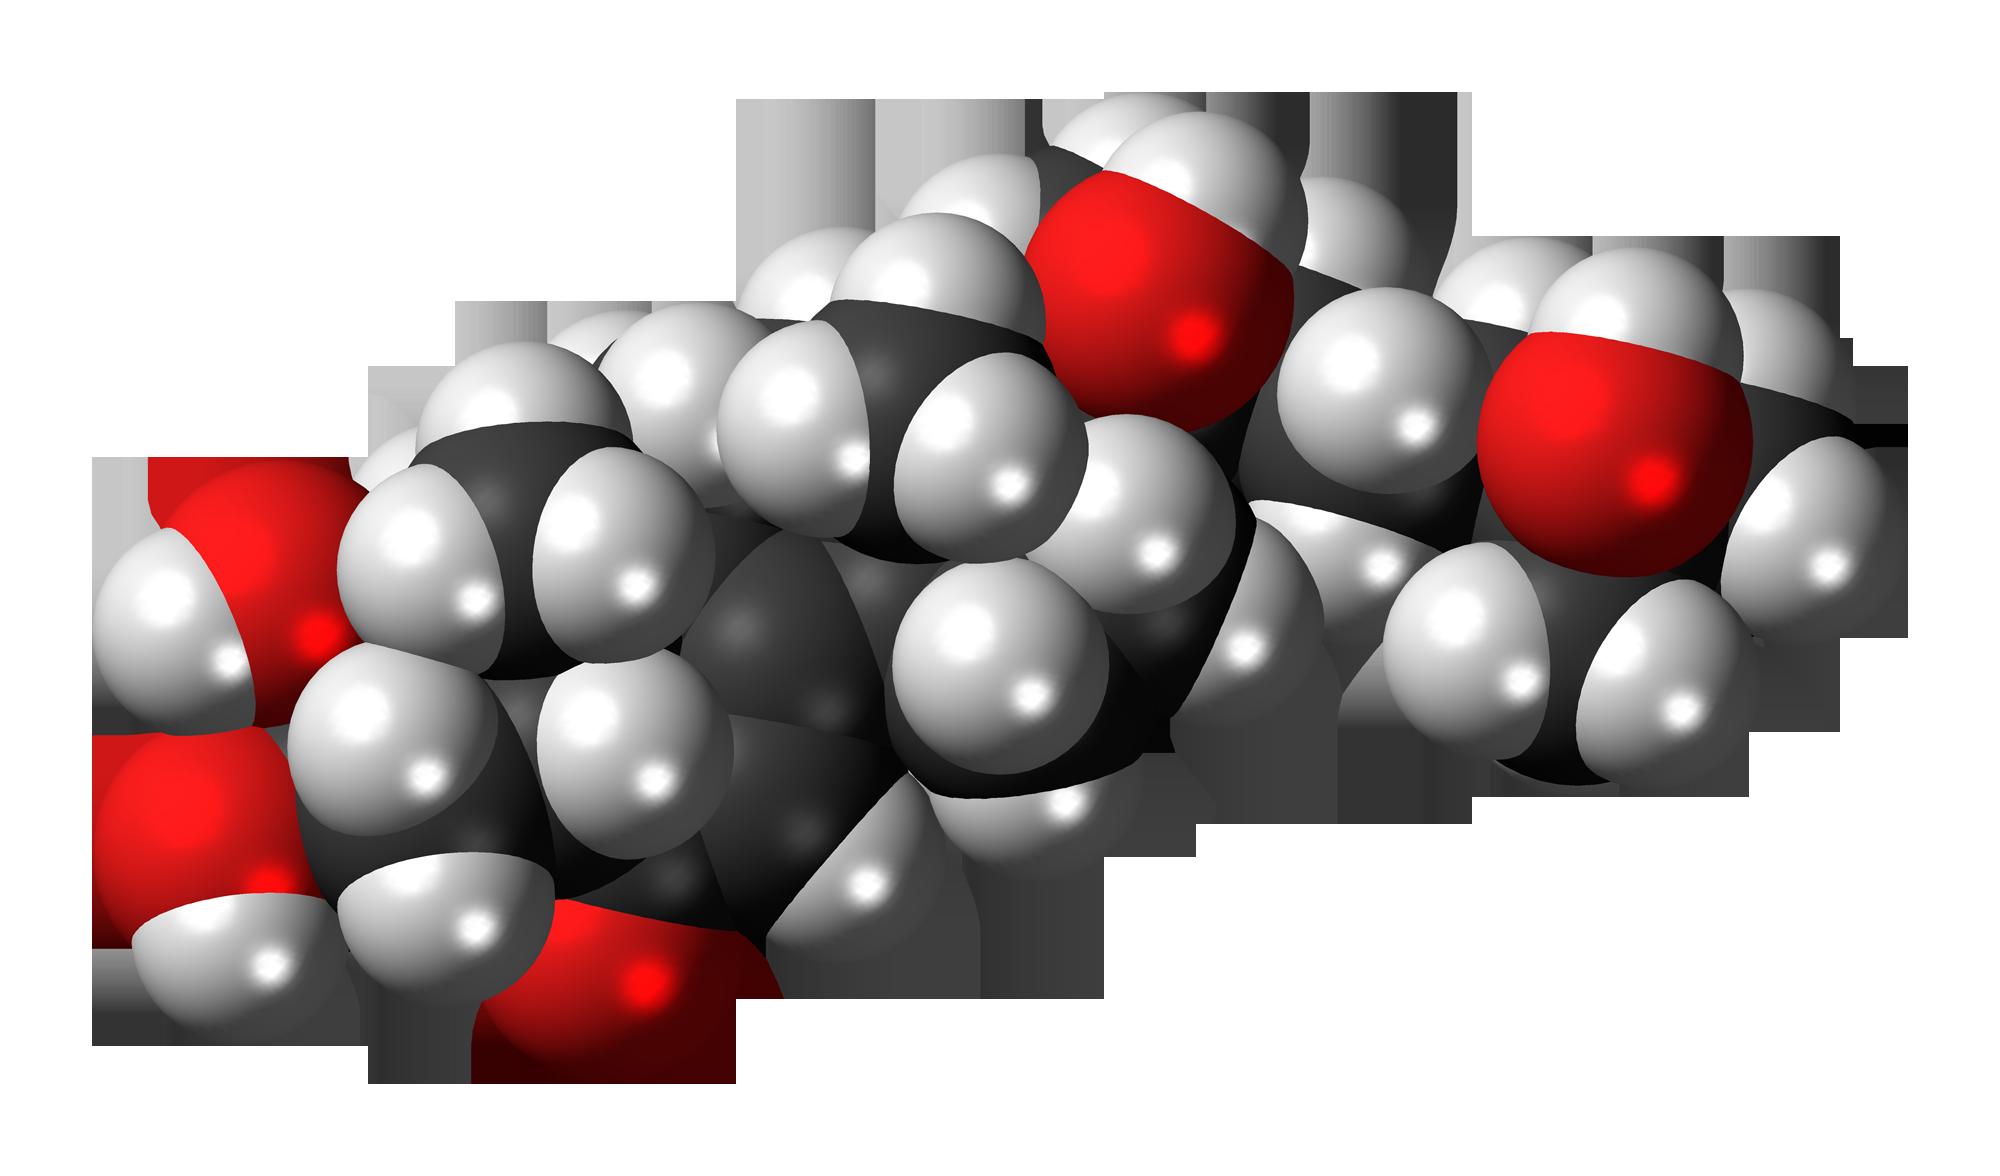 20-Hydroxyecdysone: The Pro-Anabolic, Plant Steroid